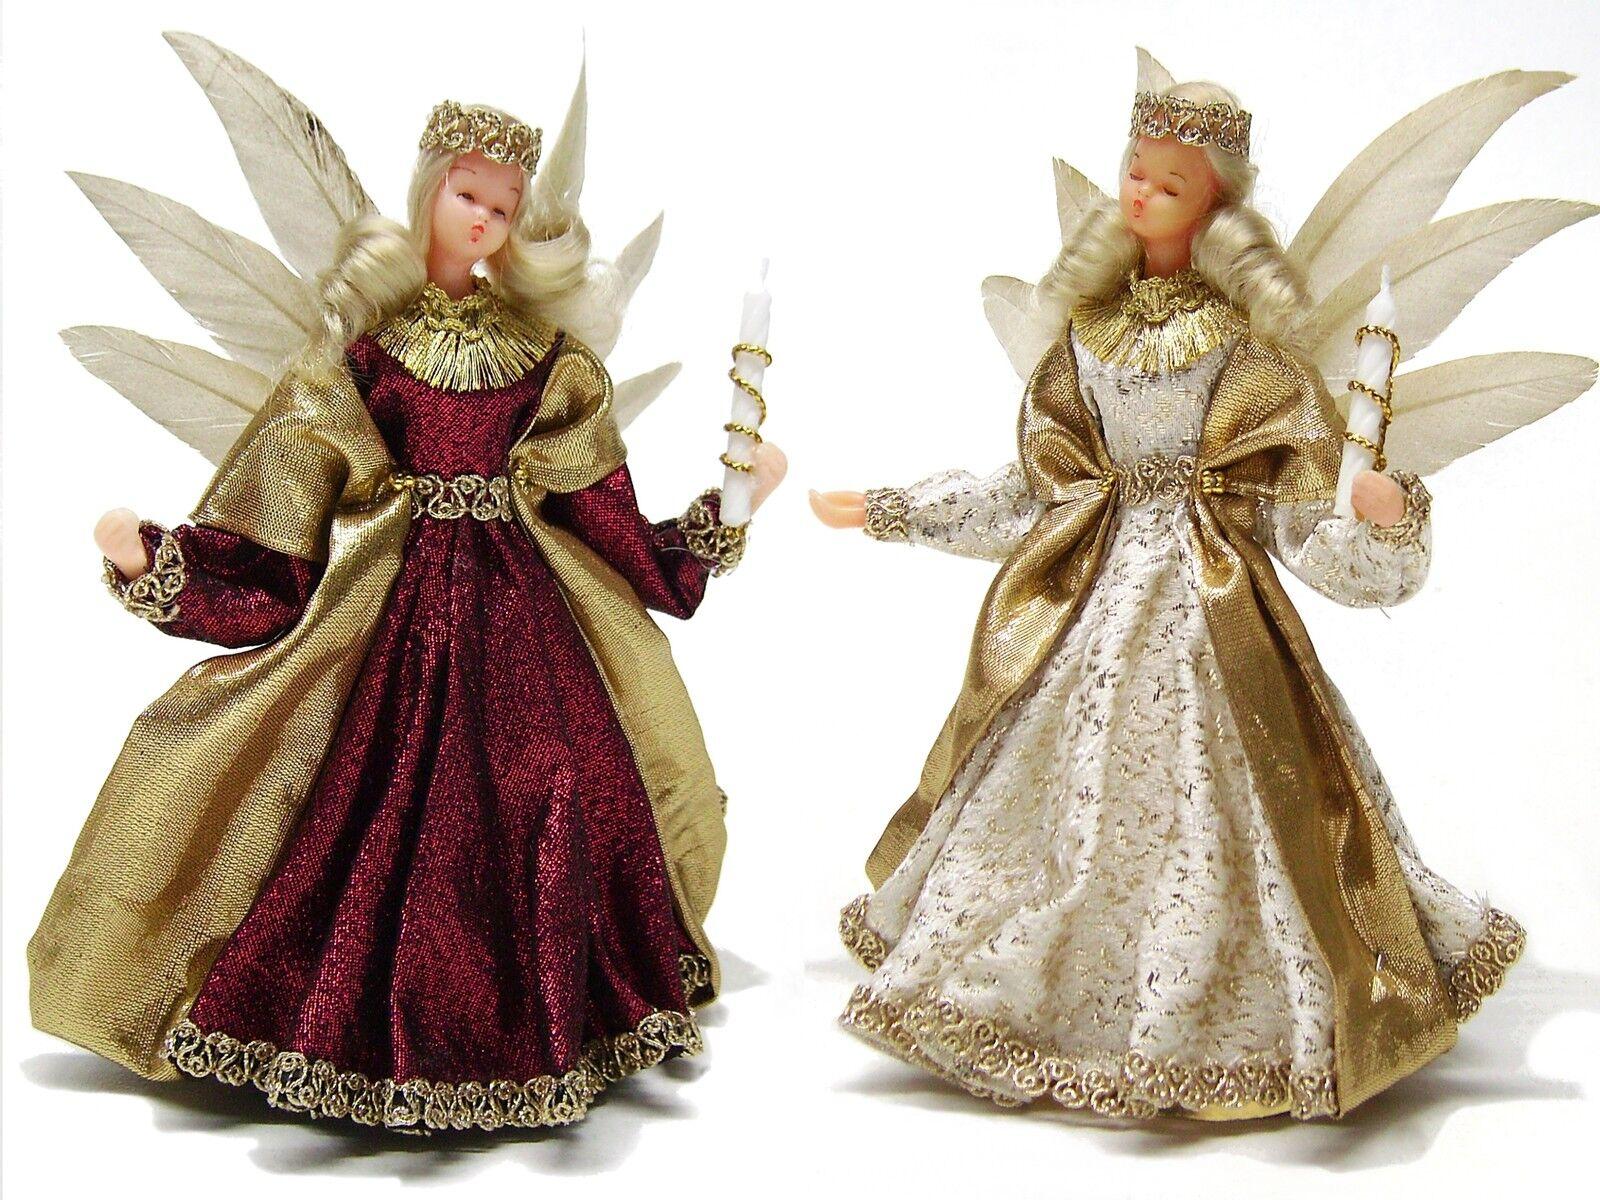 engel mit federn wachskopf rauschgoldengel angel handmade 19cm eur 39 50. Black Bedroom Furniture Sets. Home Design Ideas